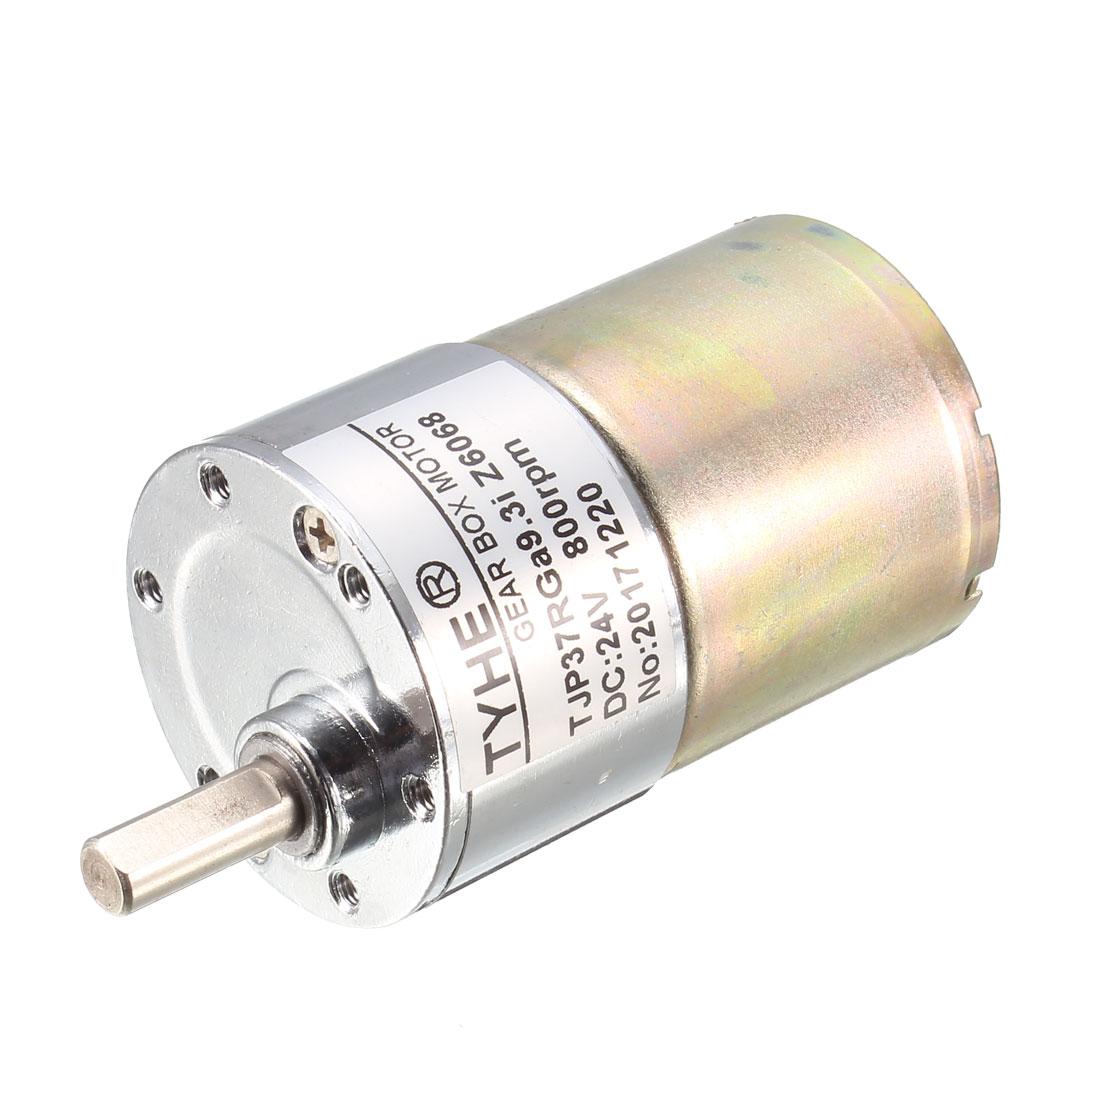 DC 24V 800RPM 6mm Shaft Dia Direct Current Gear Reduction Motor TJP37RGa9.3i-Z6068